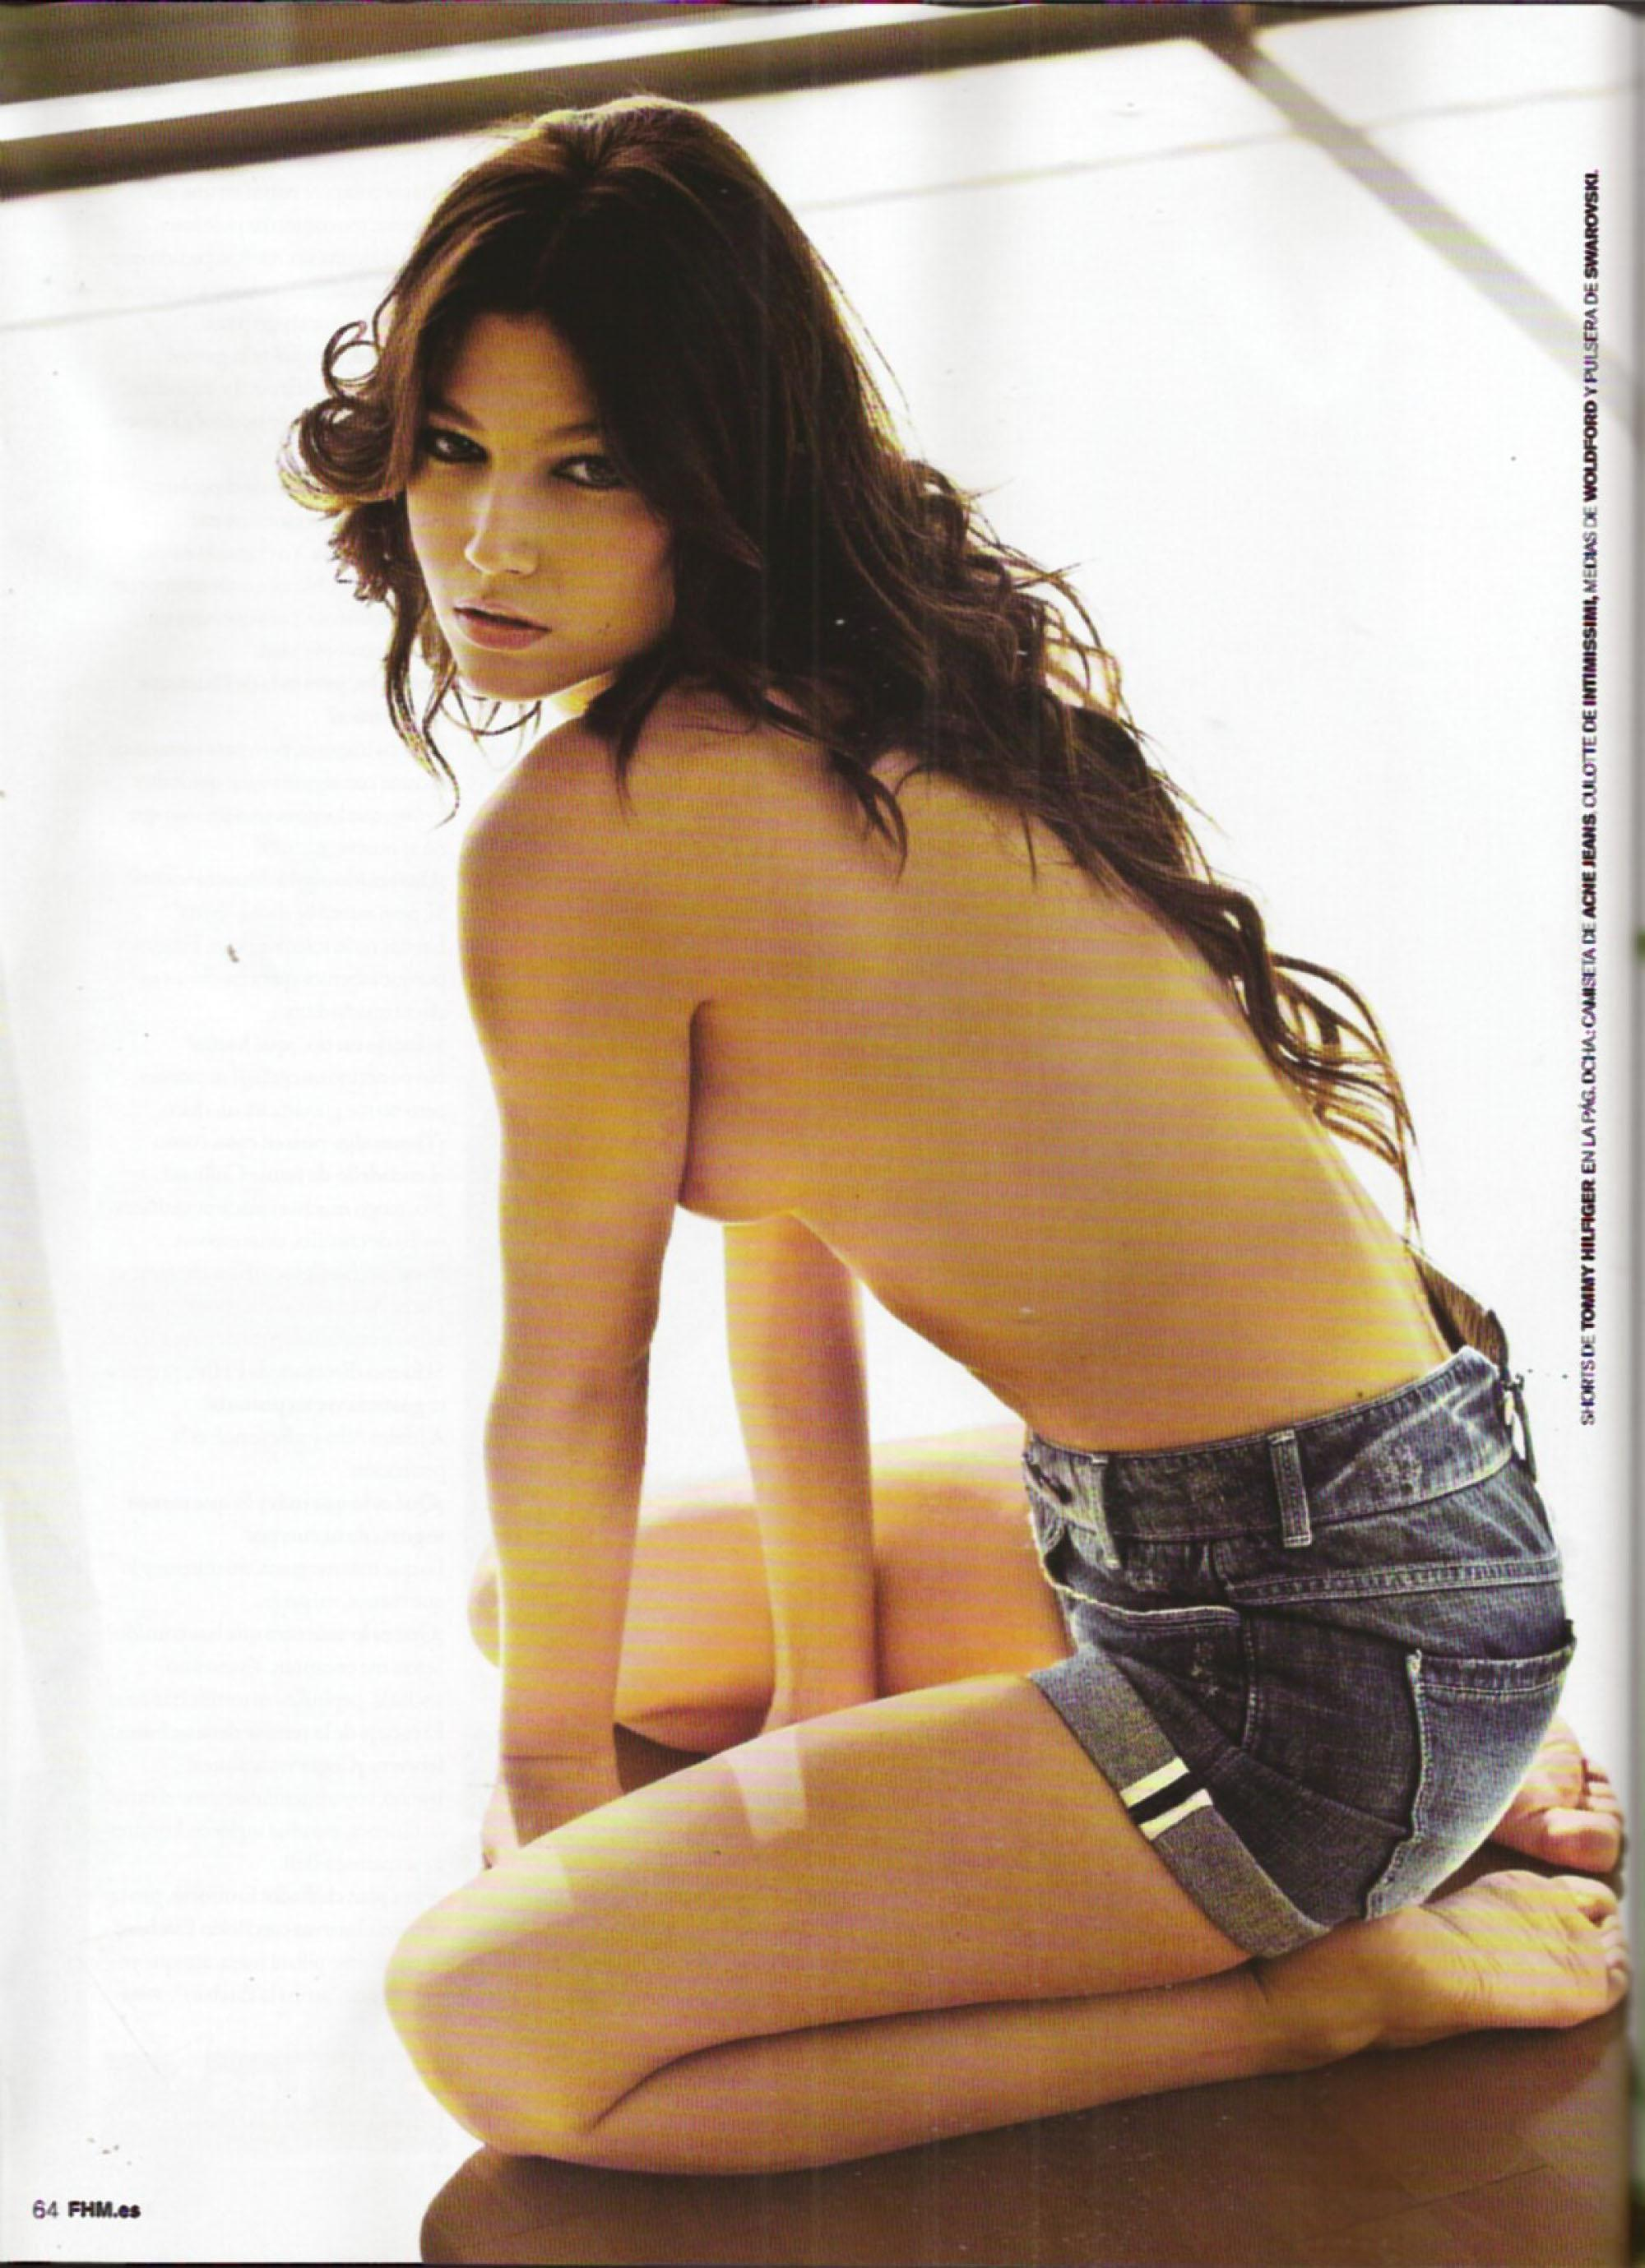 Úrsula Corberó totalmente desnuda